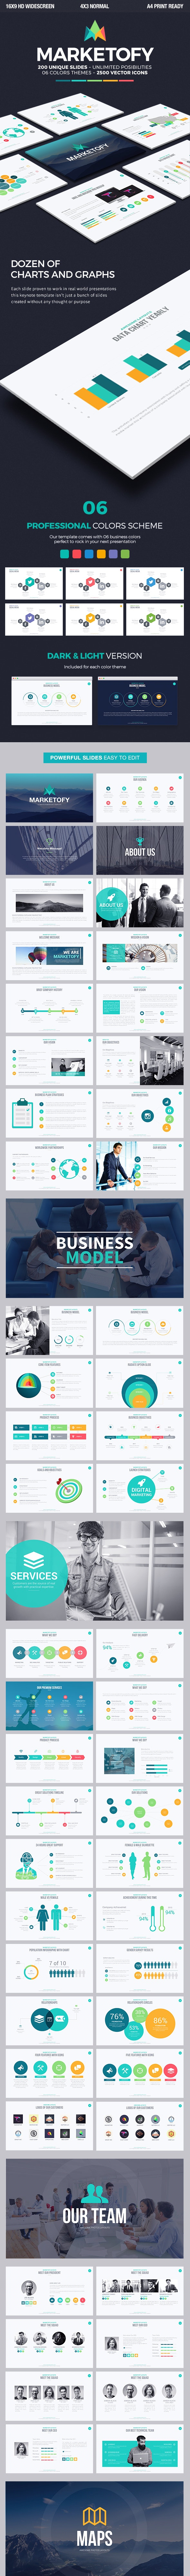 Marketofy - Ultimate Keynote Template - Business Keynote Templates